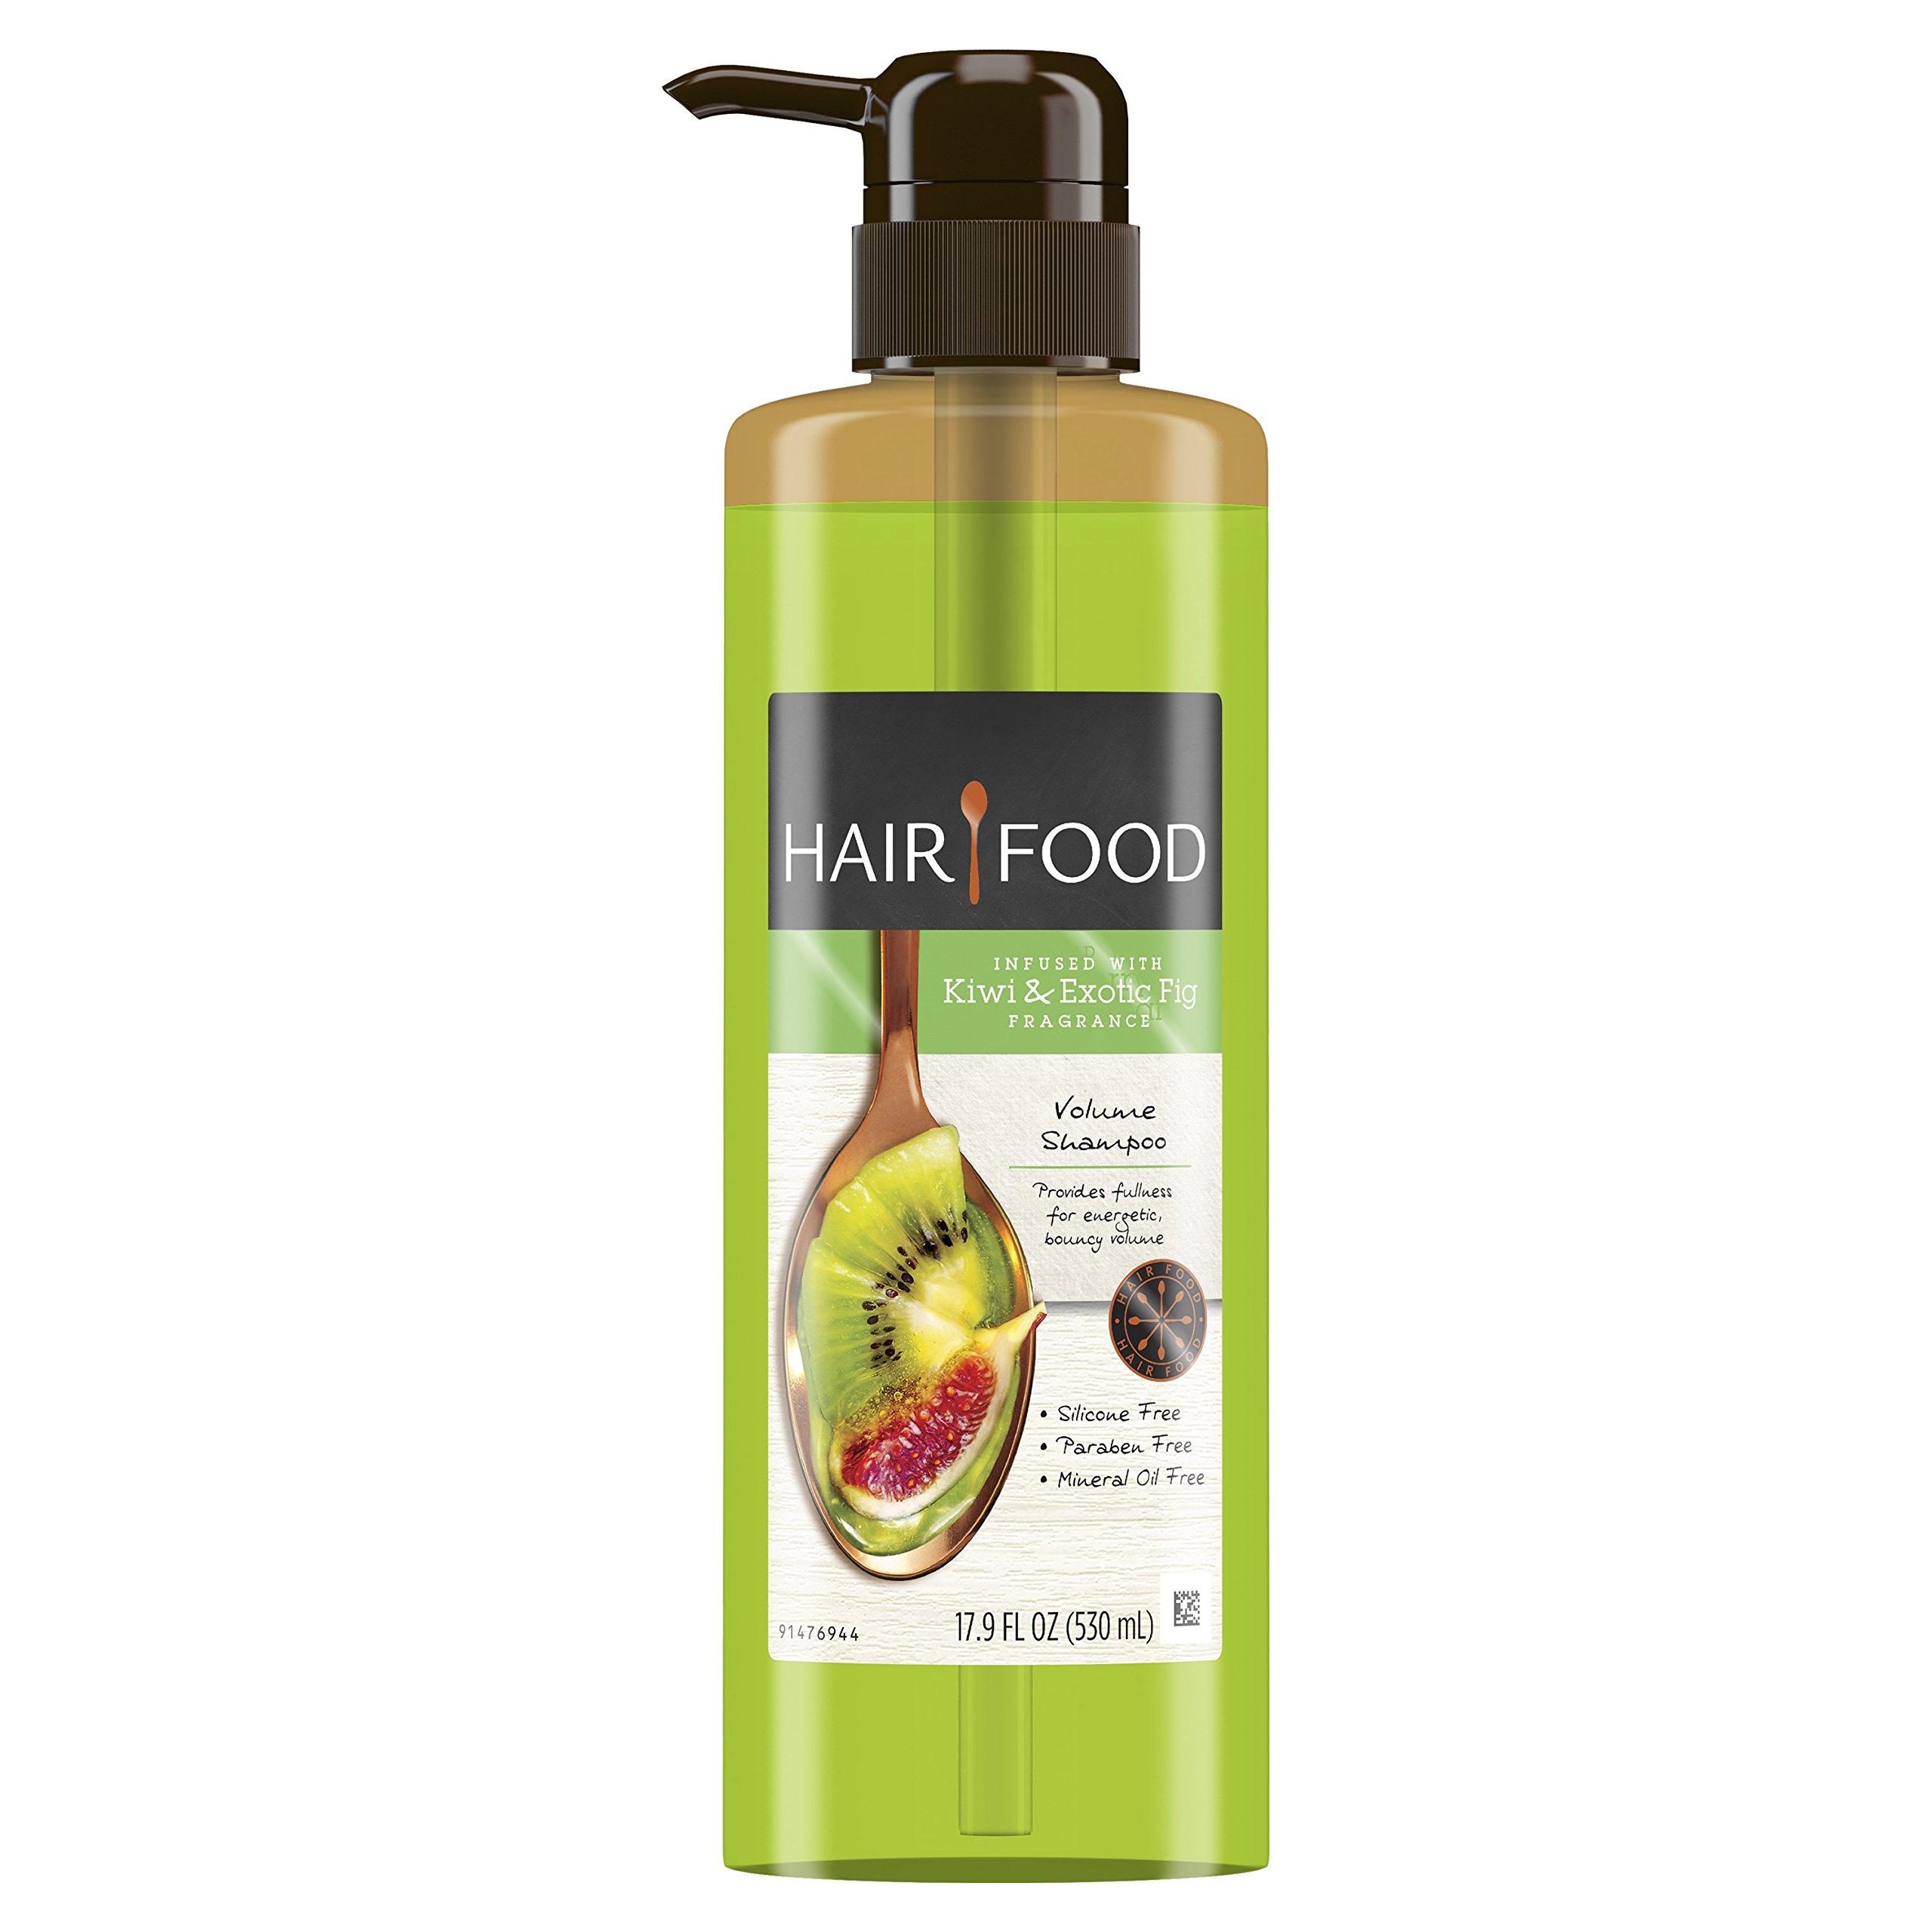 Hair Food Volume Shampoo Infused With Kiwi Fragrance 17.9 fl oz by HAIR FOOD